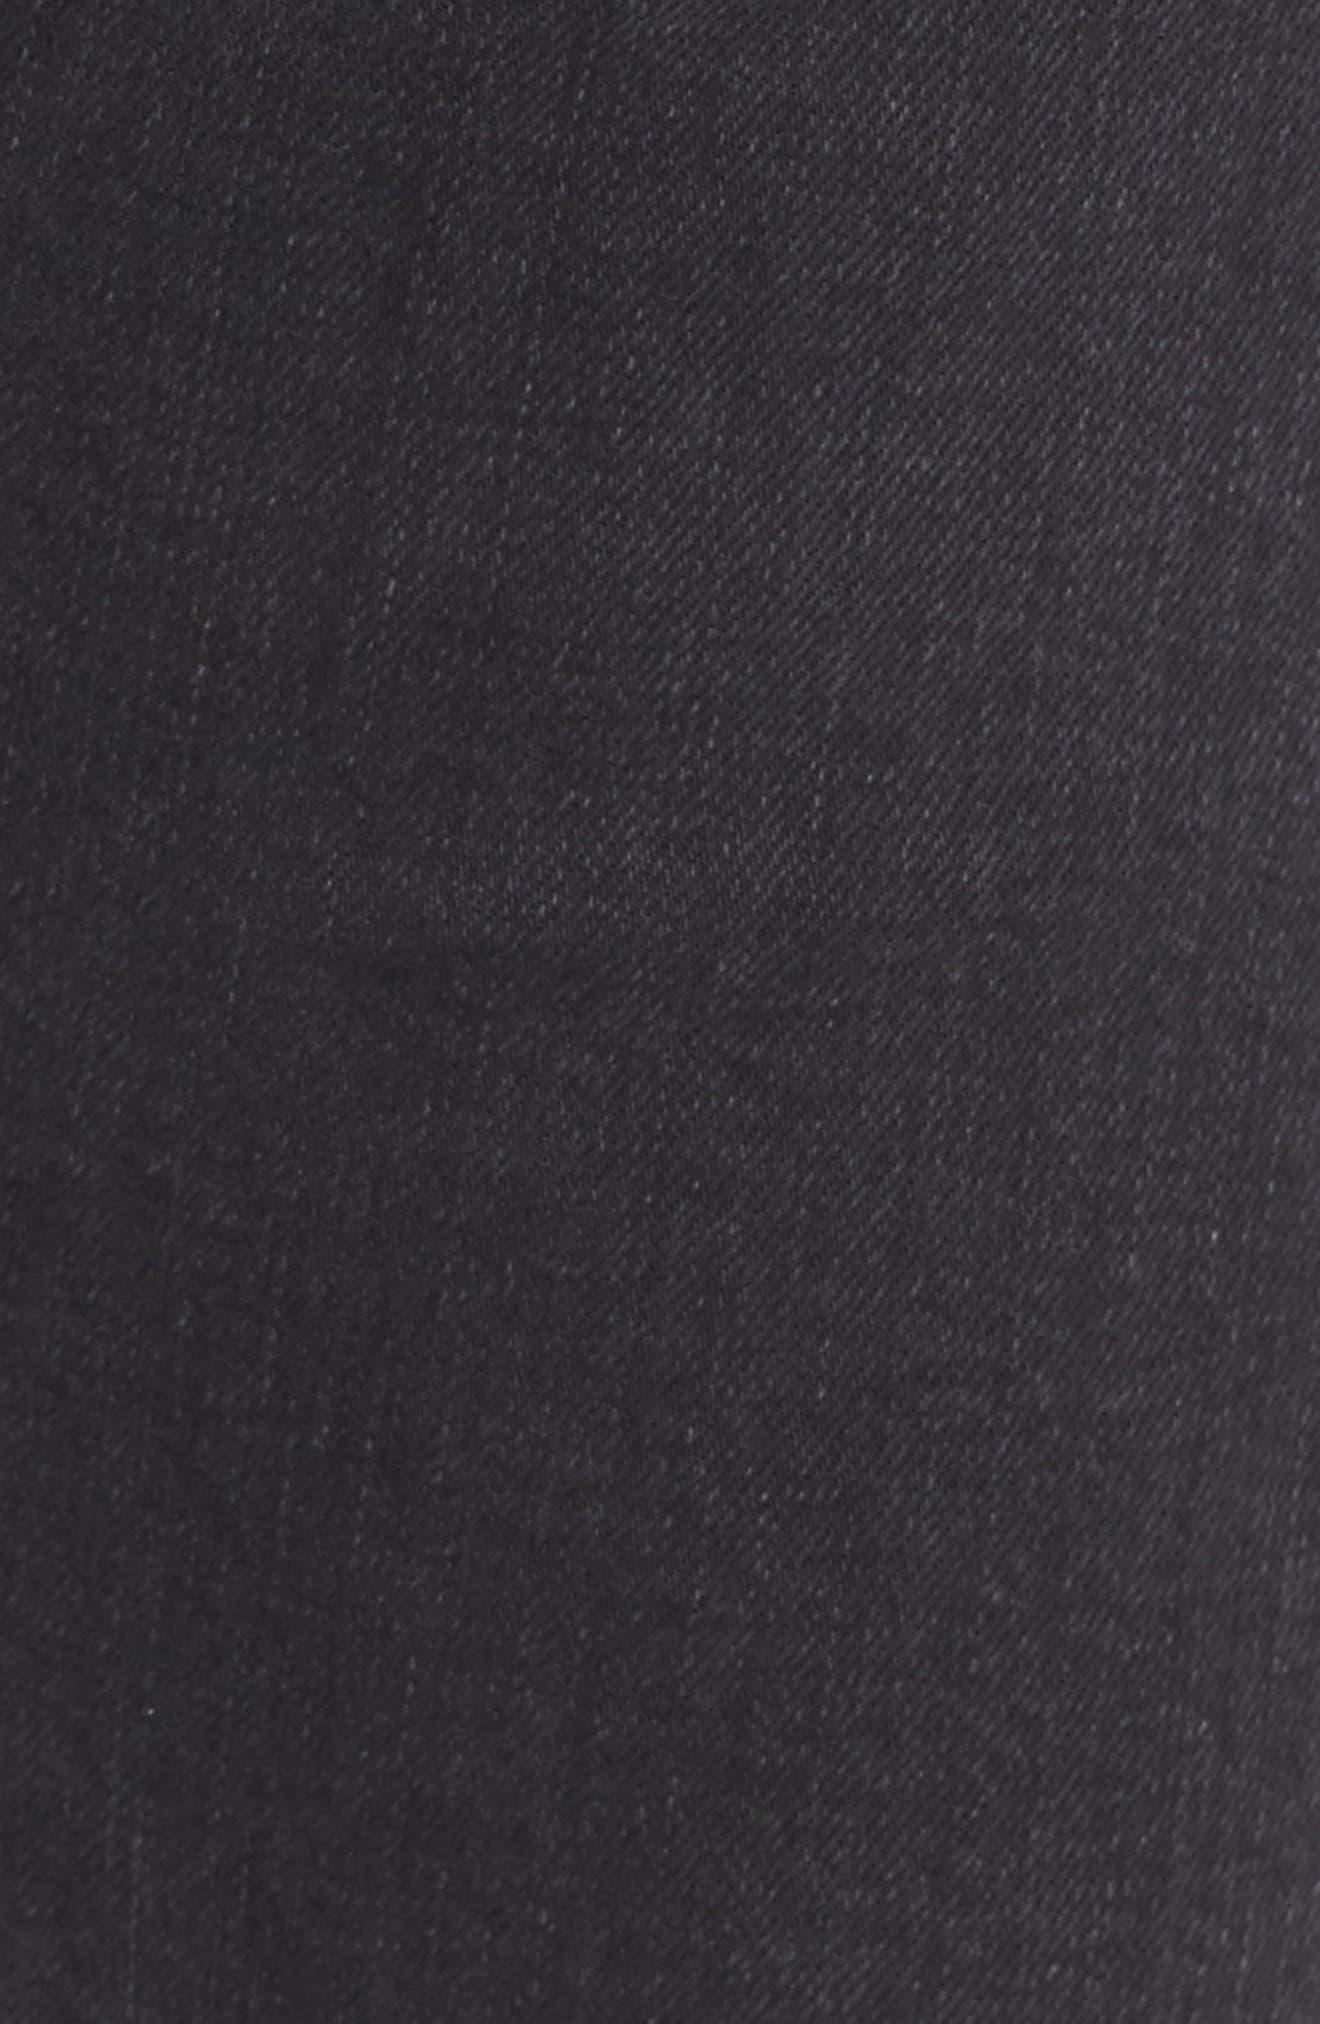 Chloe Low Rise Slim Jeans,                             Alternate thumbnail 5, color,                             072